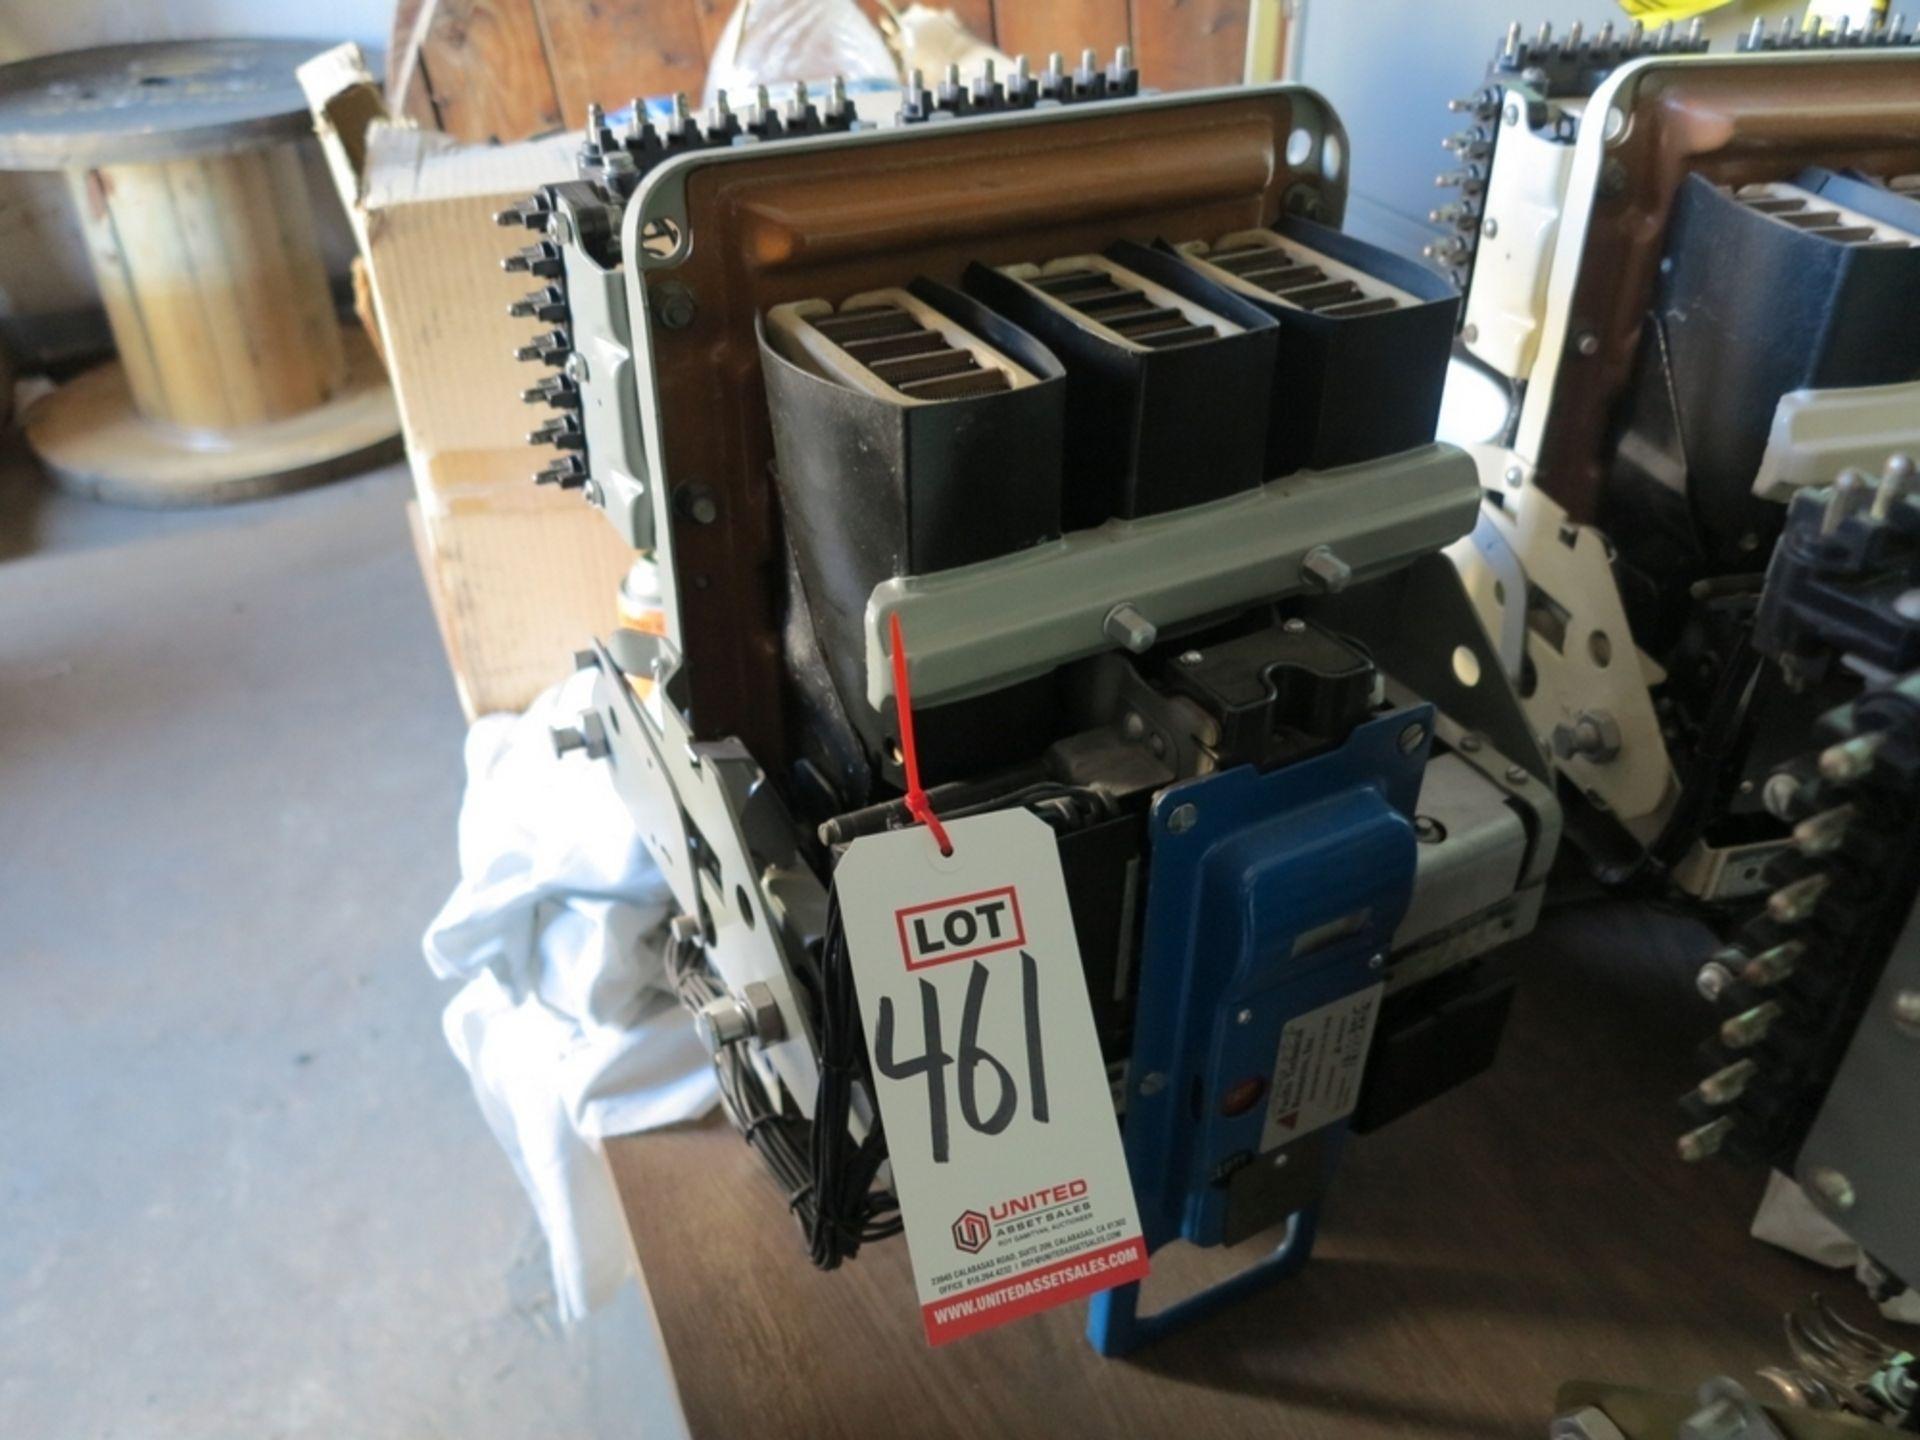 Lot 461 - GE LOW VOLTAGE CIRCUIT BREAKER, 600 V, TYPE: AK-2A-25